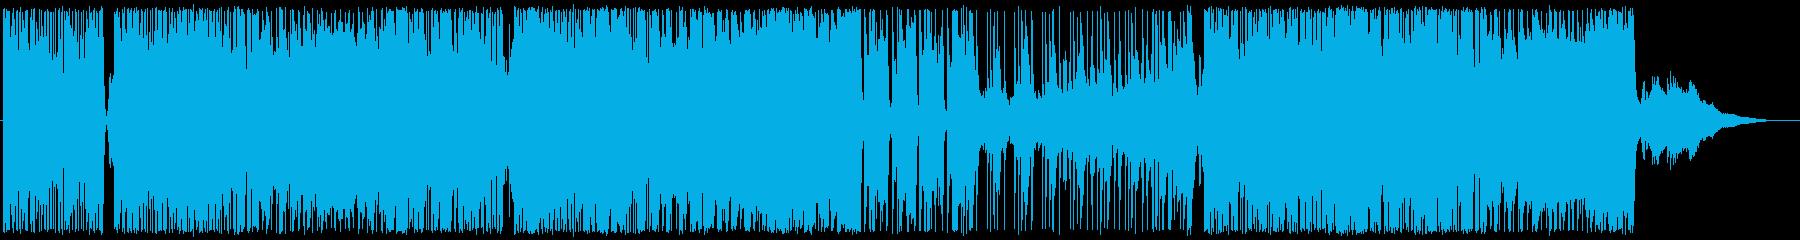 Occam's Razorの再生済みの波形